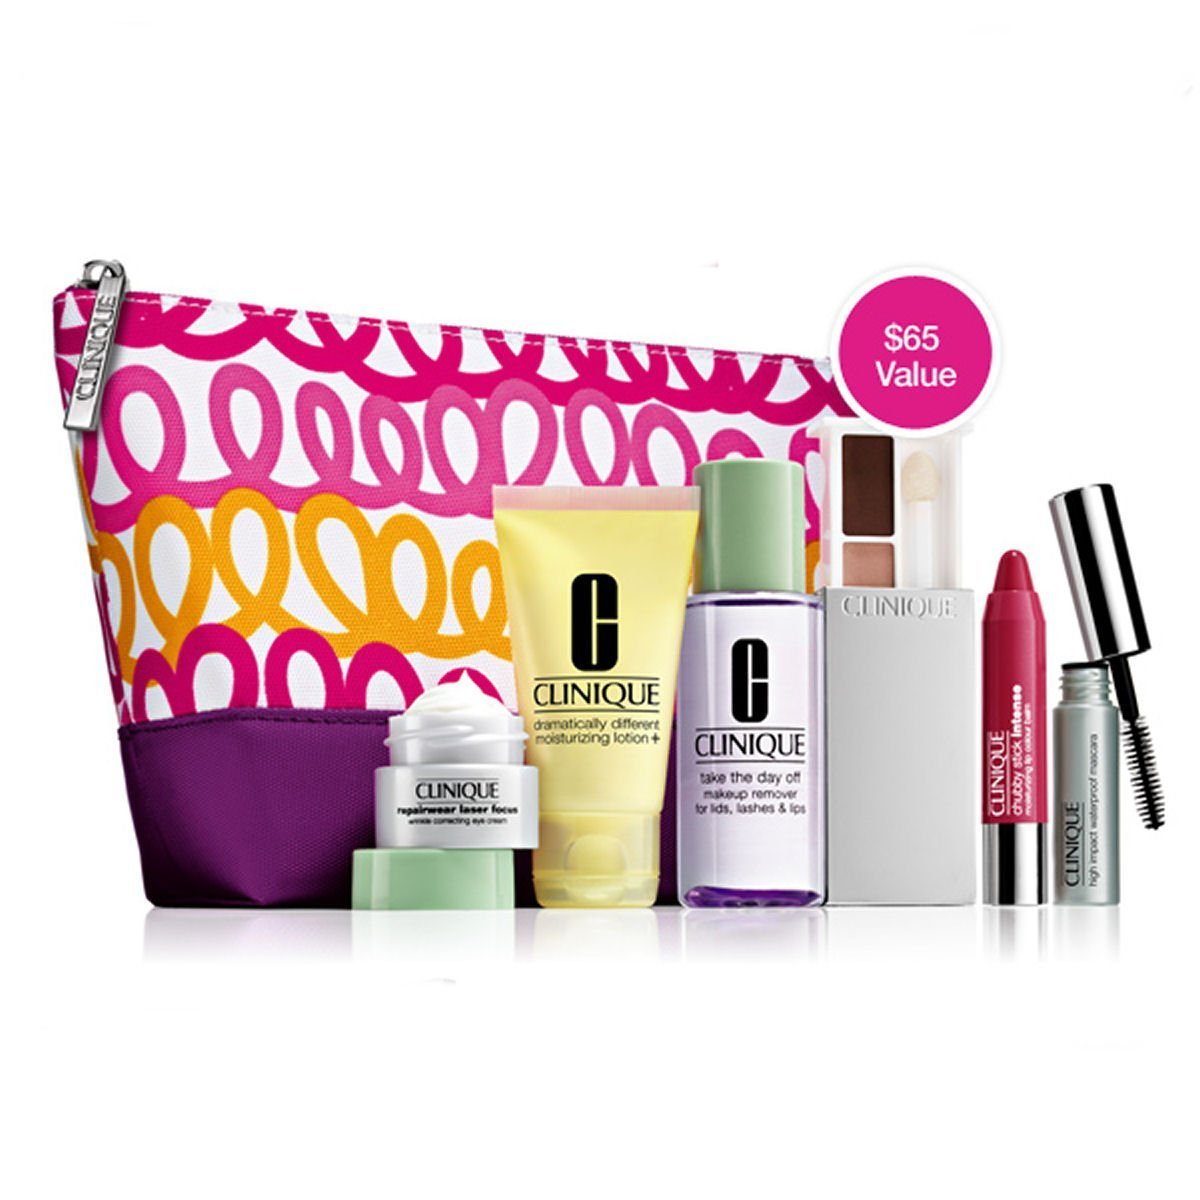 Clinique Bonus Set $22.48 From Amazon {a $65 value} - The Shopper's Apprentice